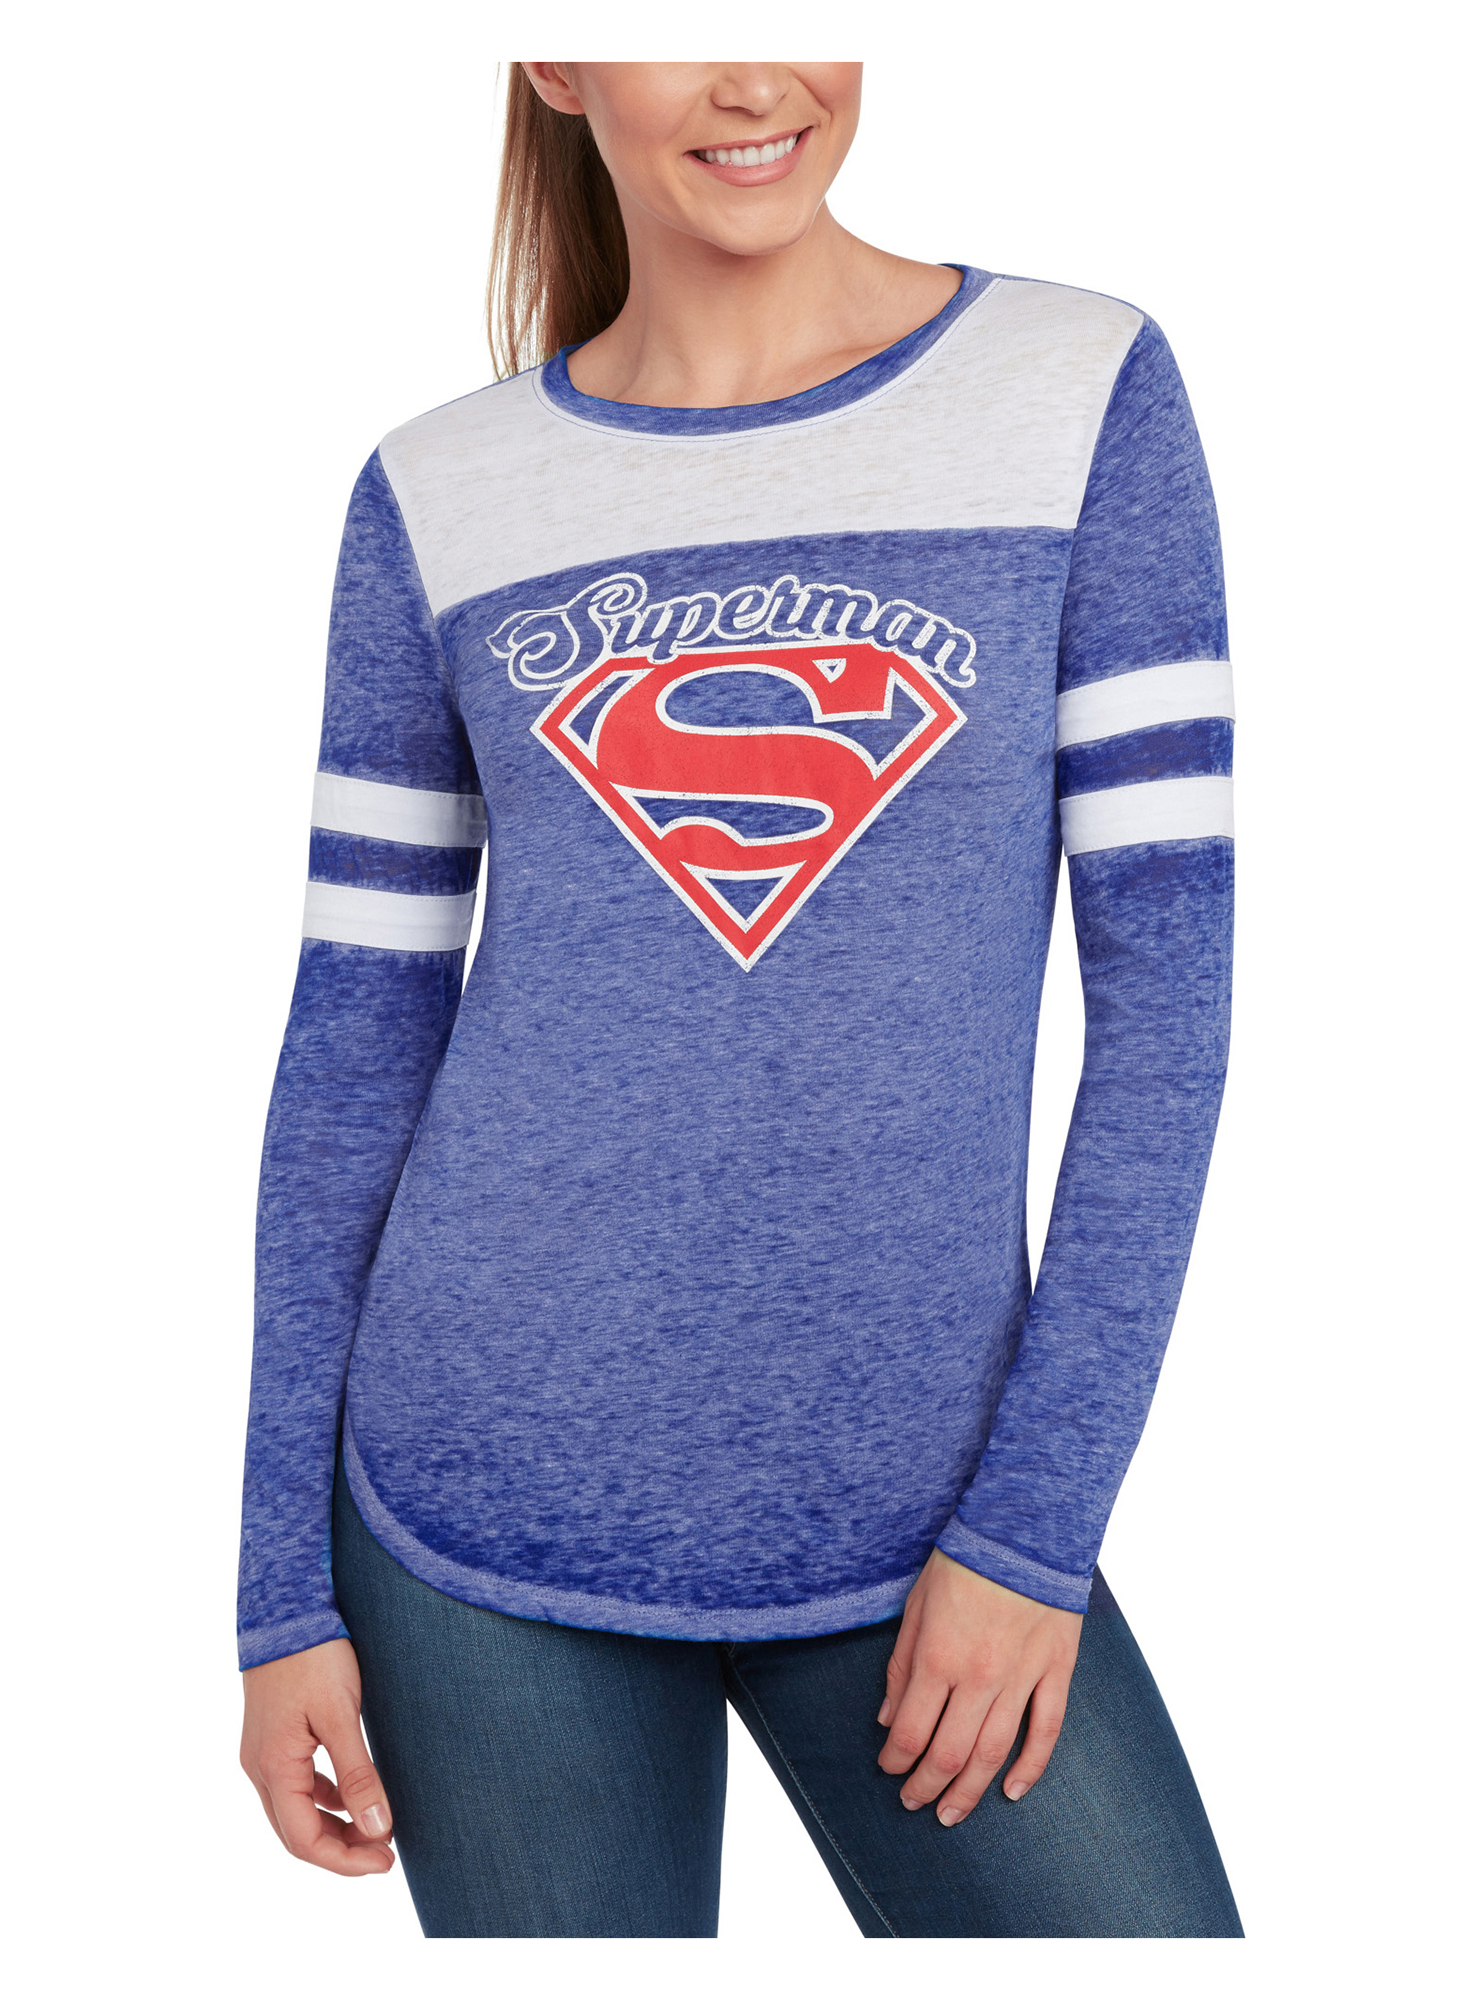 Juniors Superman Long Sleeve Shirt - Burnout Blue